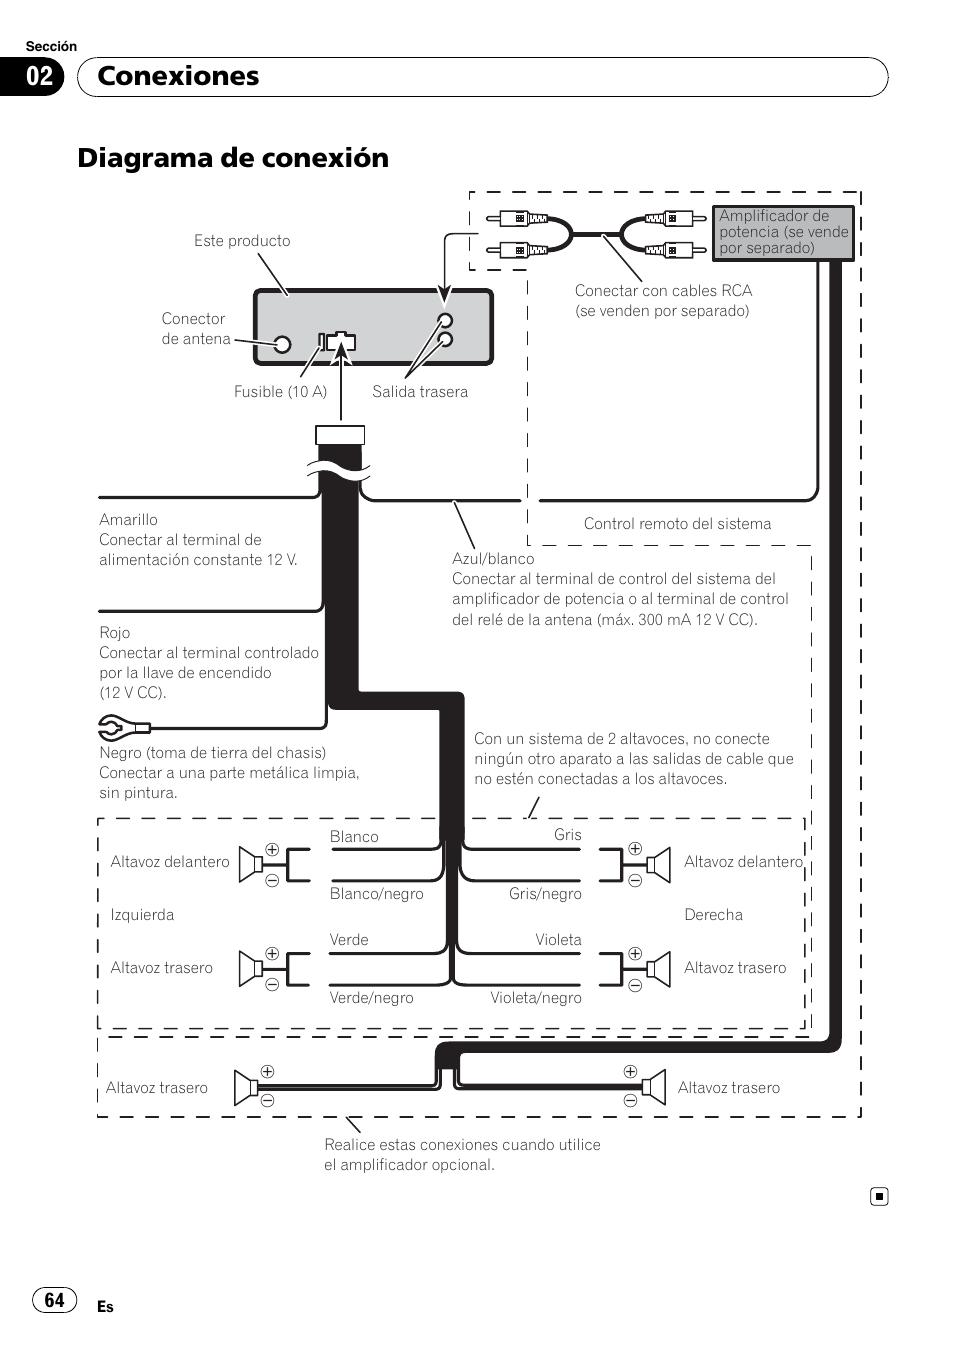 hight resolution of pioneer deh 2400ub wiring diagram efcaviation com pioneer deh 2200ub page64 pioneer deh 2400ub wiring diagram efcaviation com pioneer deh 24ub wiring